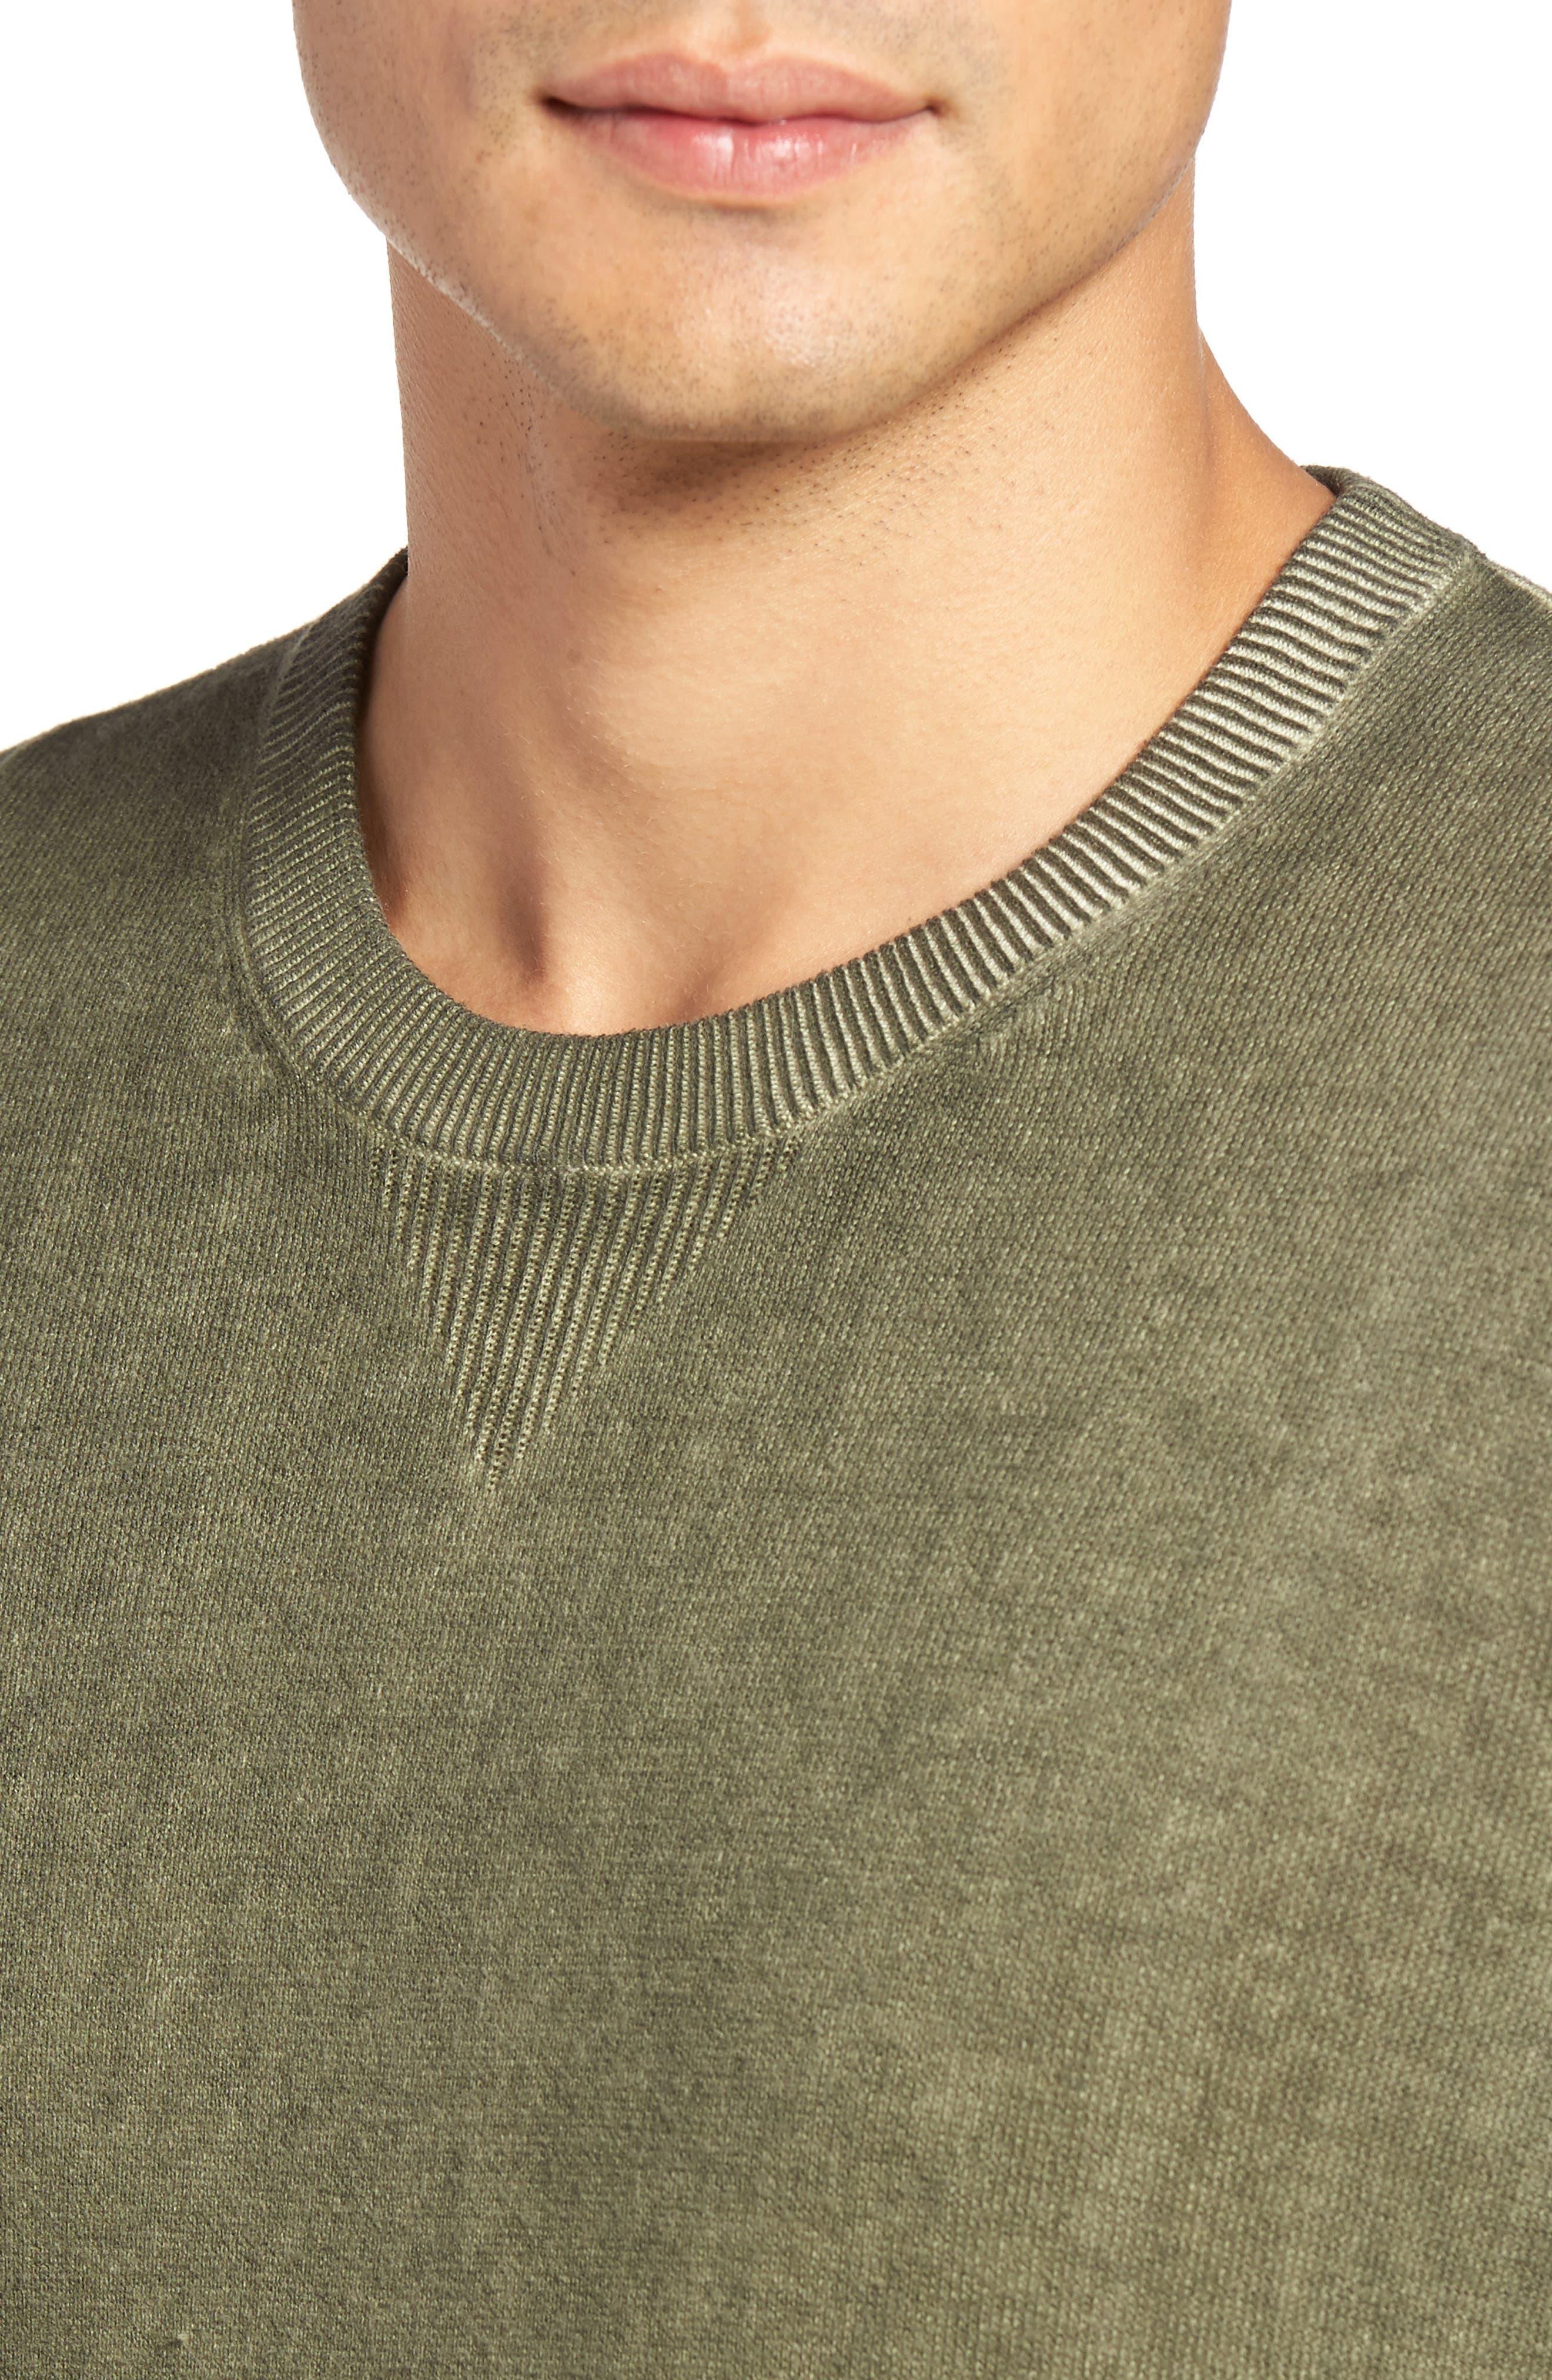 Mace Crewneck Sweater,                             Alternate thumbnail 4, color,                             316